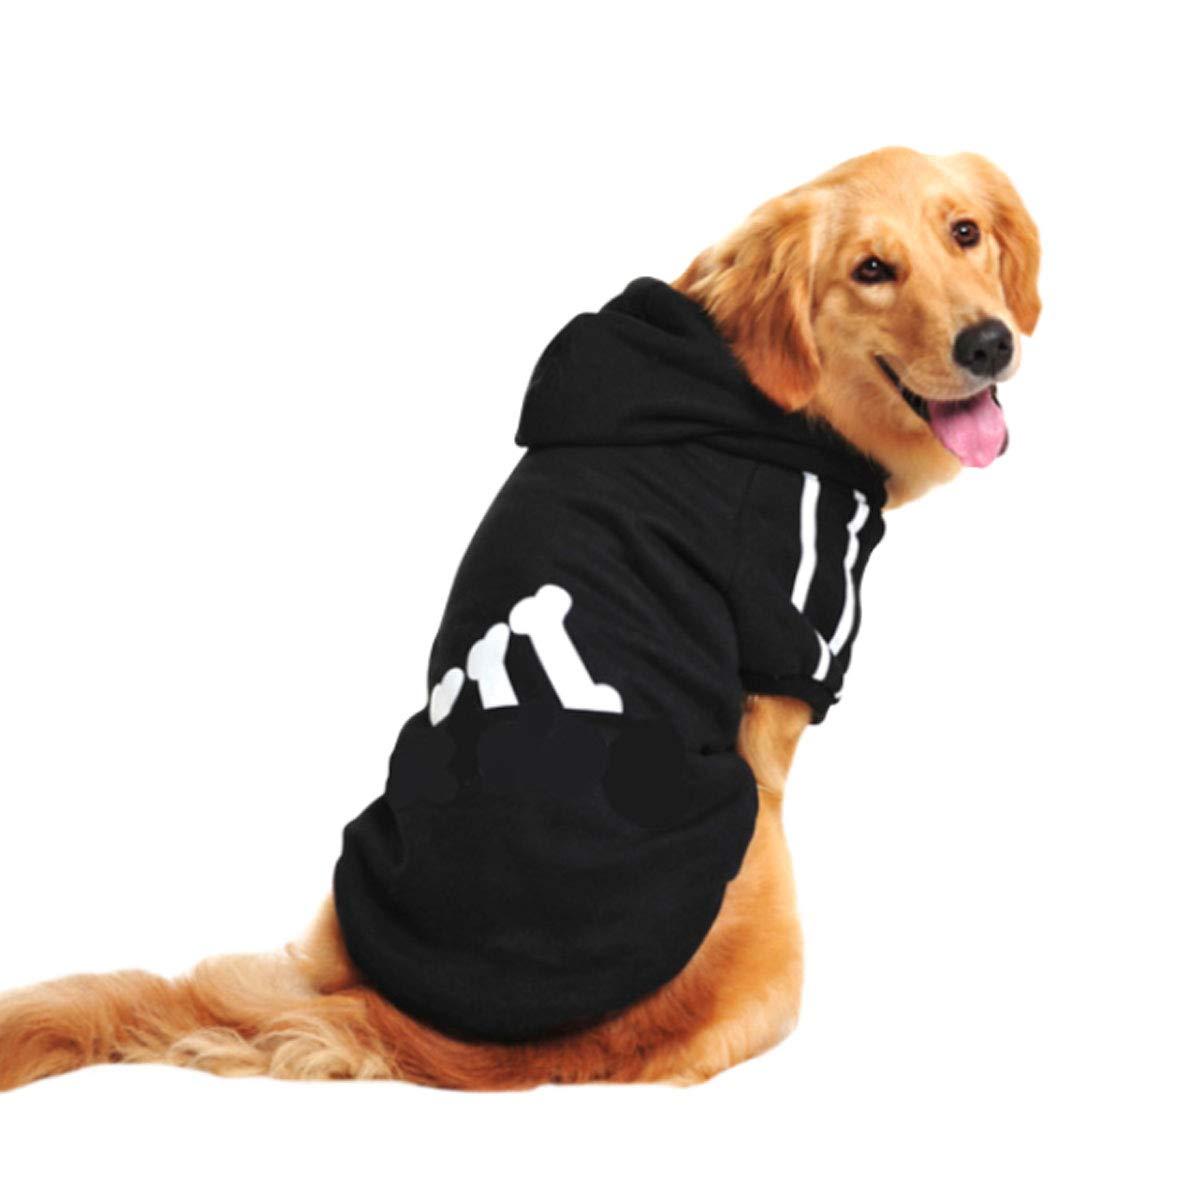 Black 9xl Black 9xl Haoyushangmao Dog Clothes, Pet Clothes, Autumn and Winter Clothes, Medium and Large Dogs, golden Hair Labrador Samoyed Siberian Husky Dog Fashion (color   Black, Size   9XL)